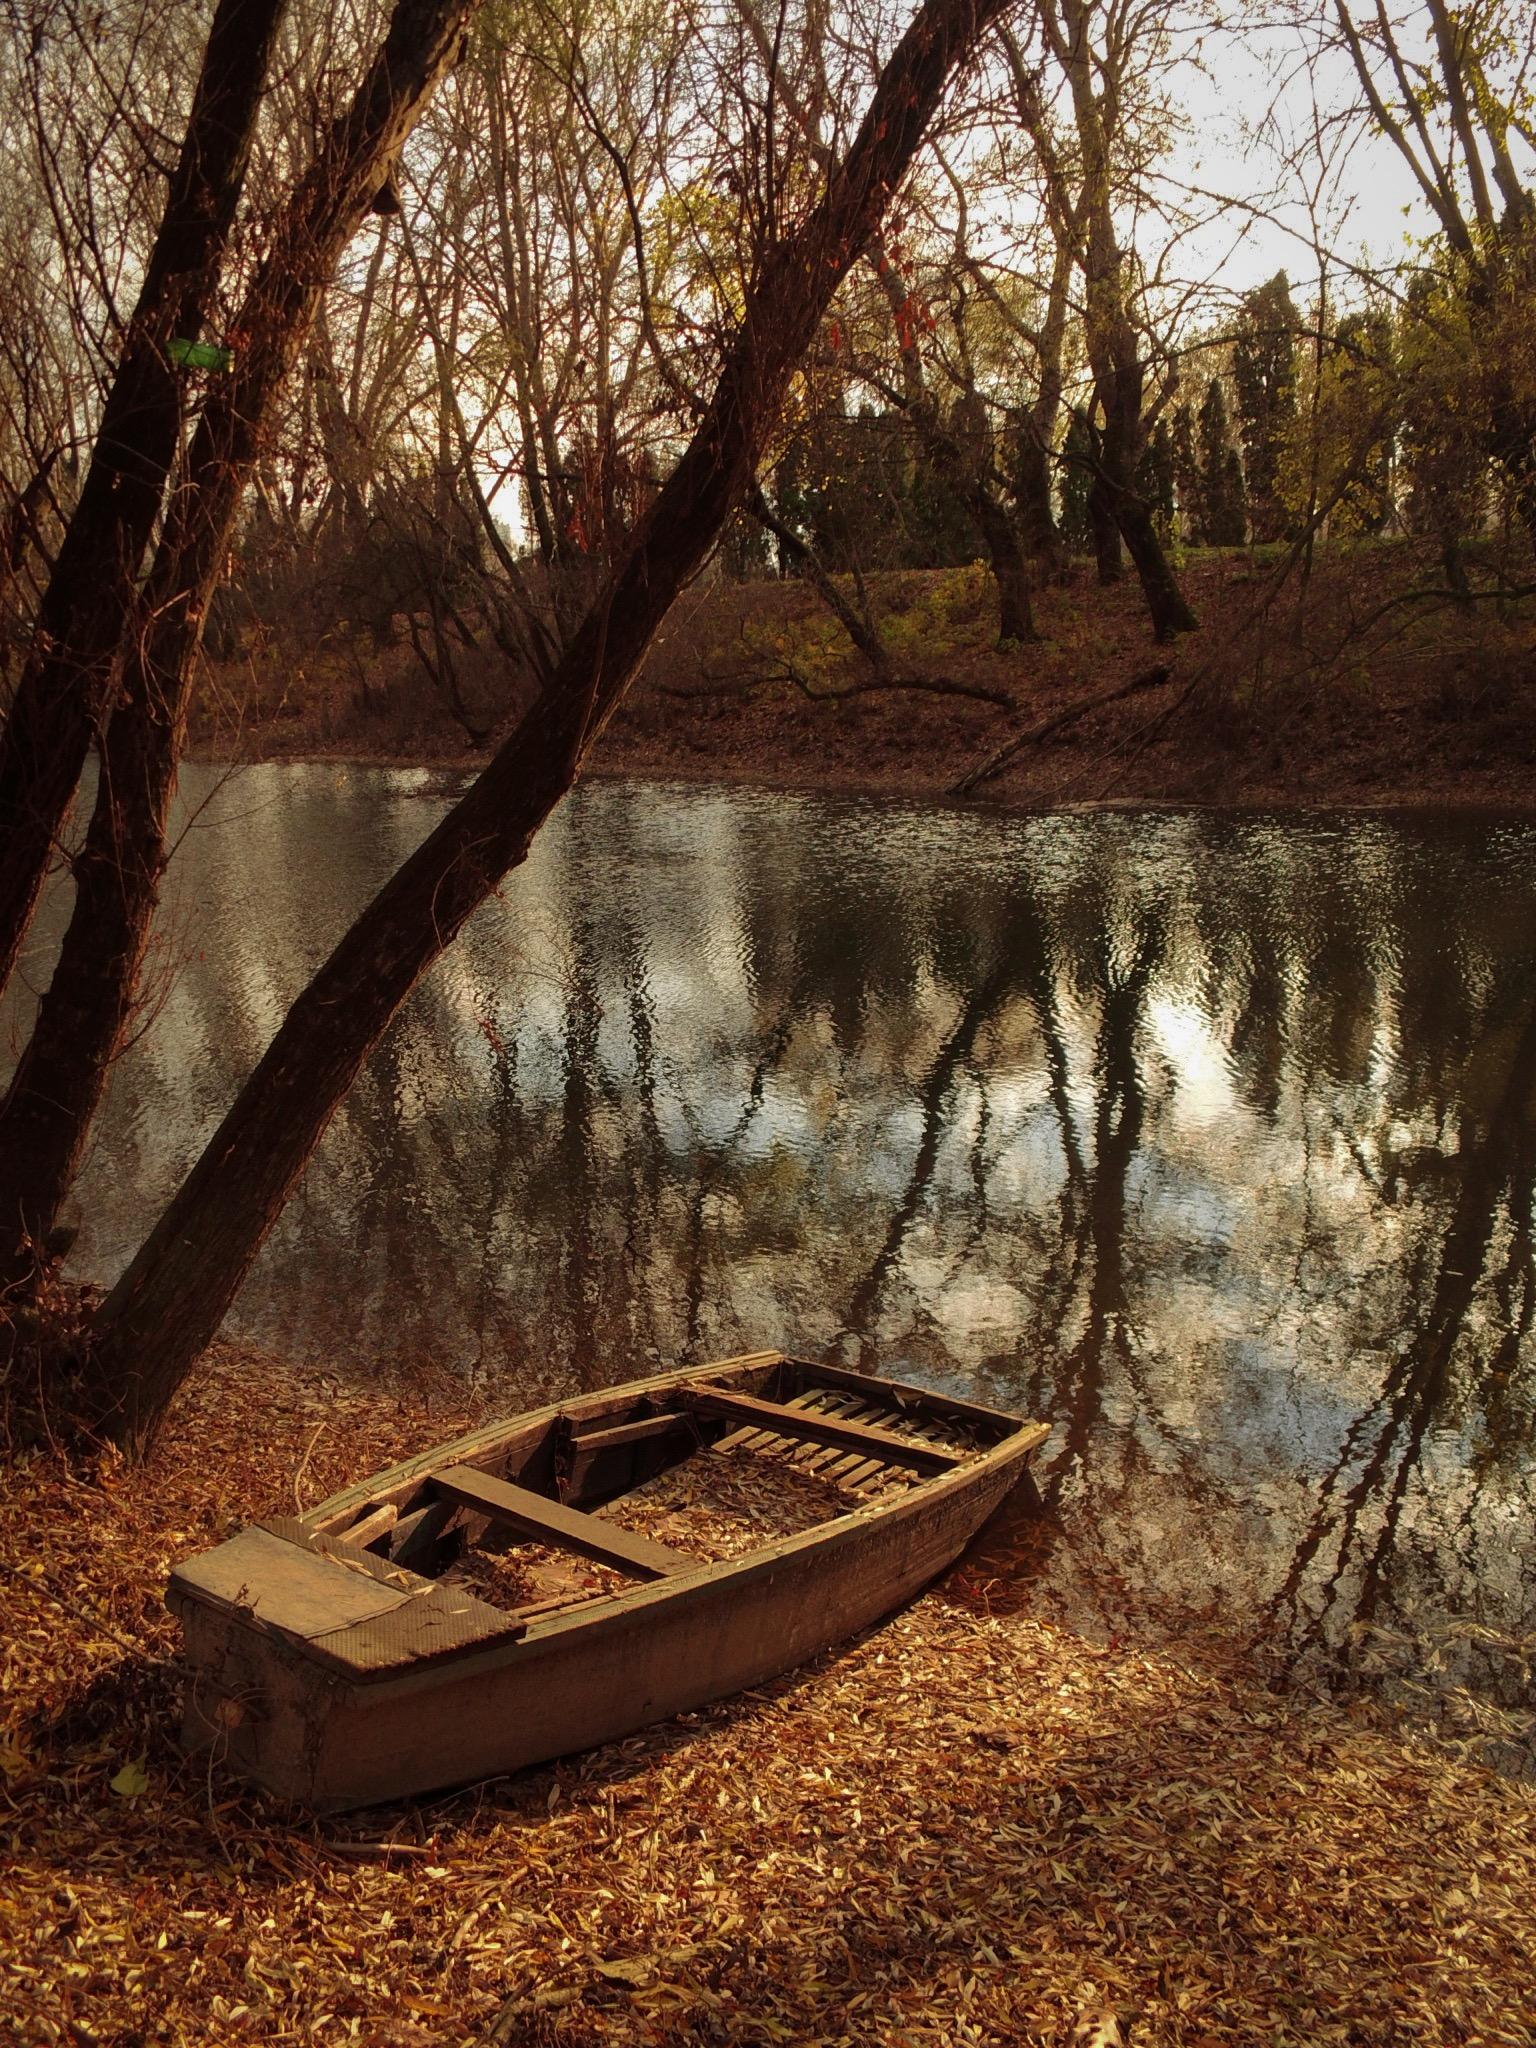 Fondos De Pantalla Naturaleza Bosque Agua 1536x2048 Kriszphoto